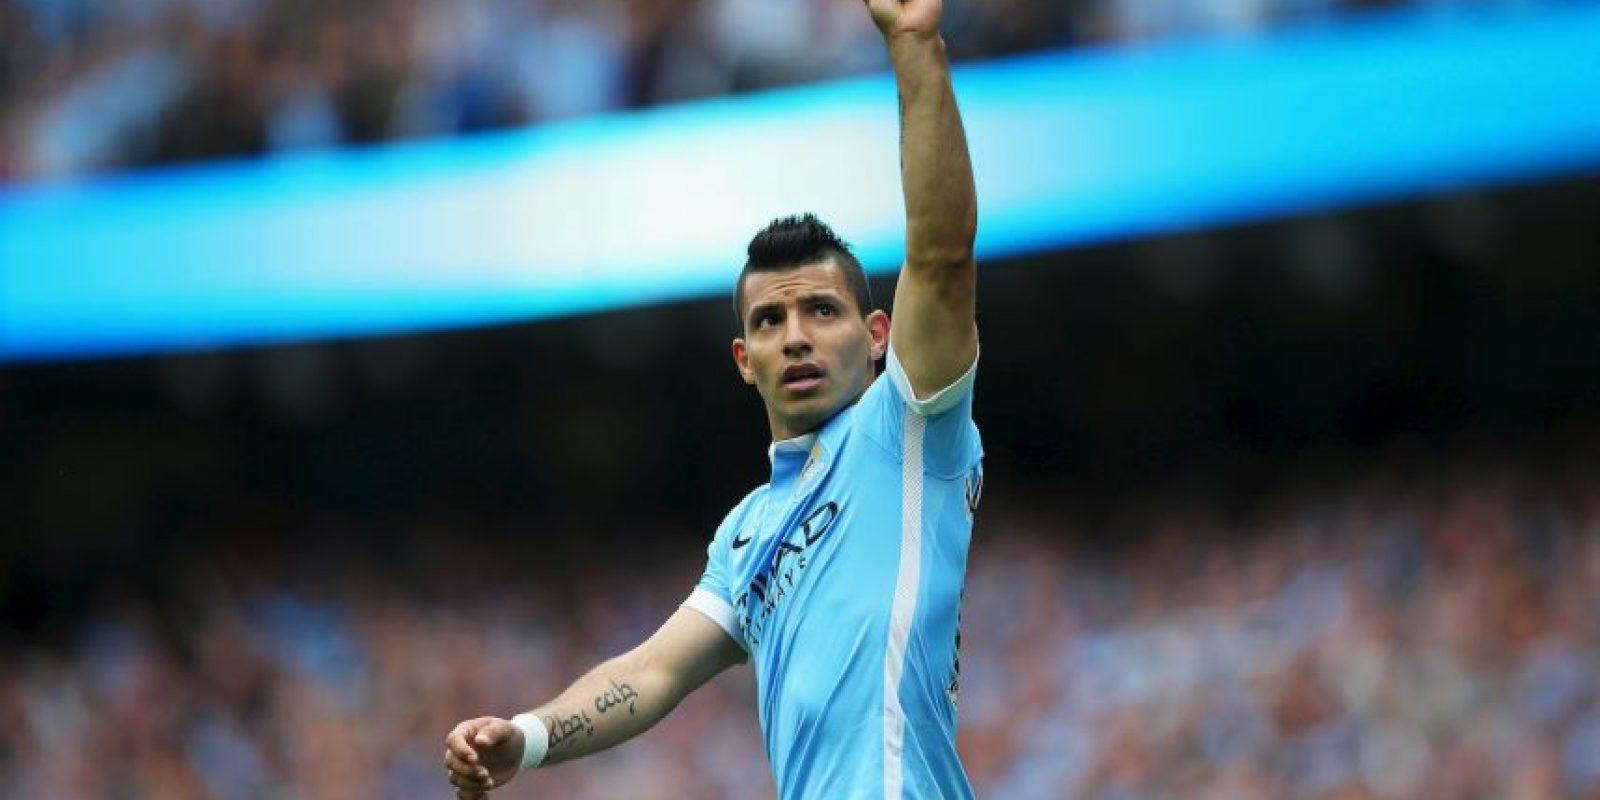 8. Sergio Aguero @aguerosergiokun (Futbol/Agentina): 45 mil 733 dólares por tuit. Foto:Getty Images